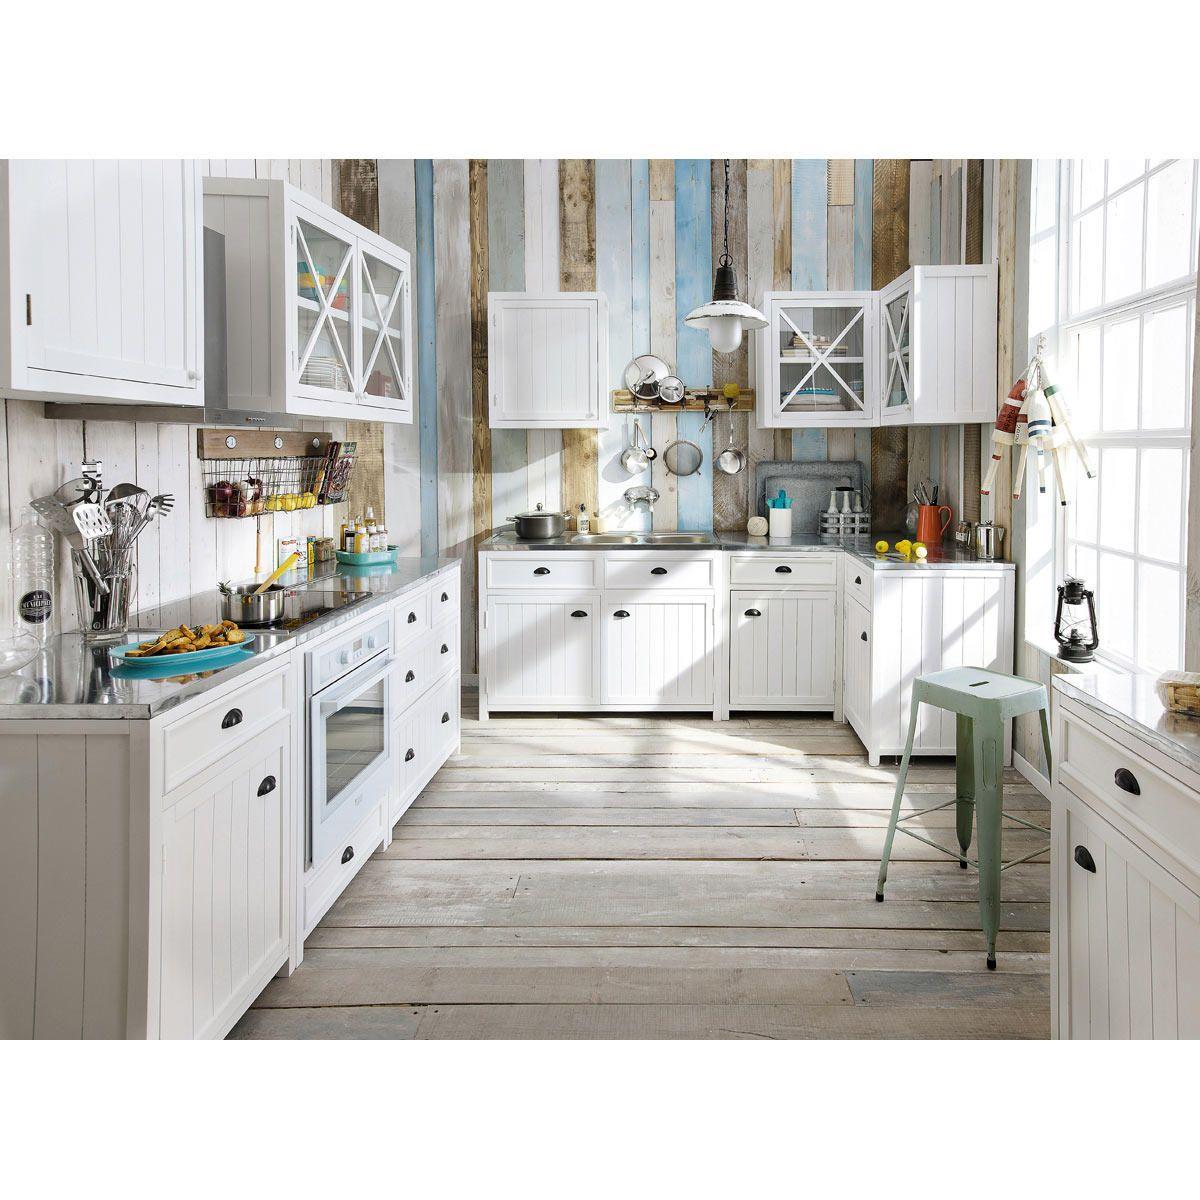 Mobile basso bianco da cucina in legno L 120 cm | Kitchen wall ...